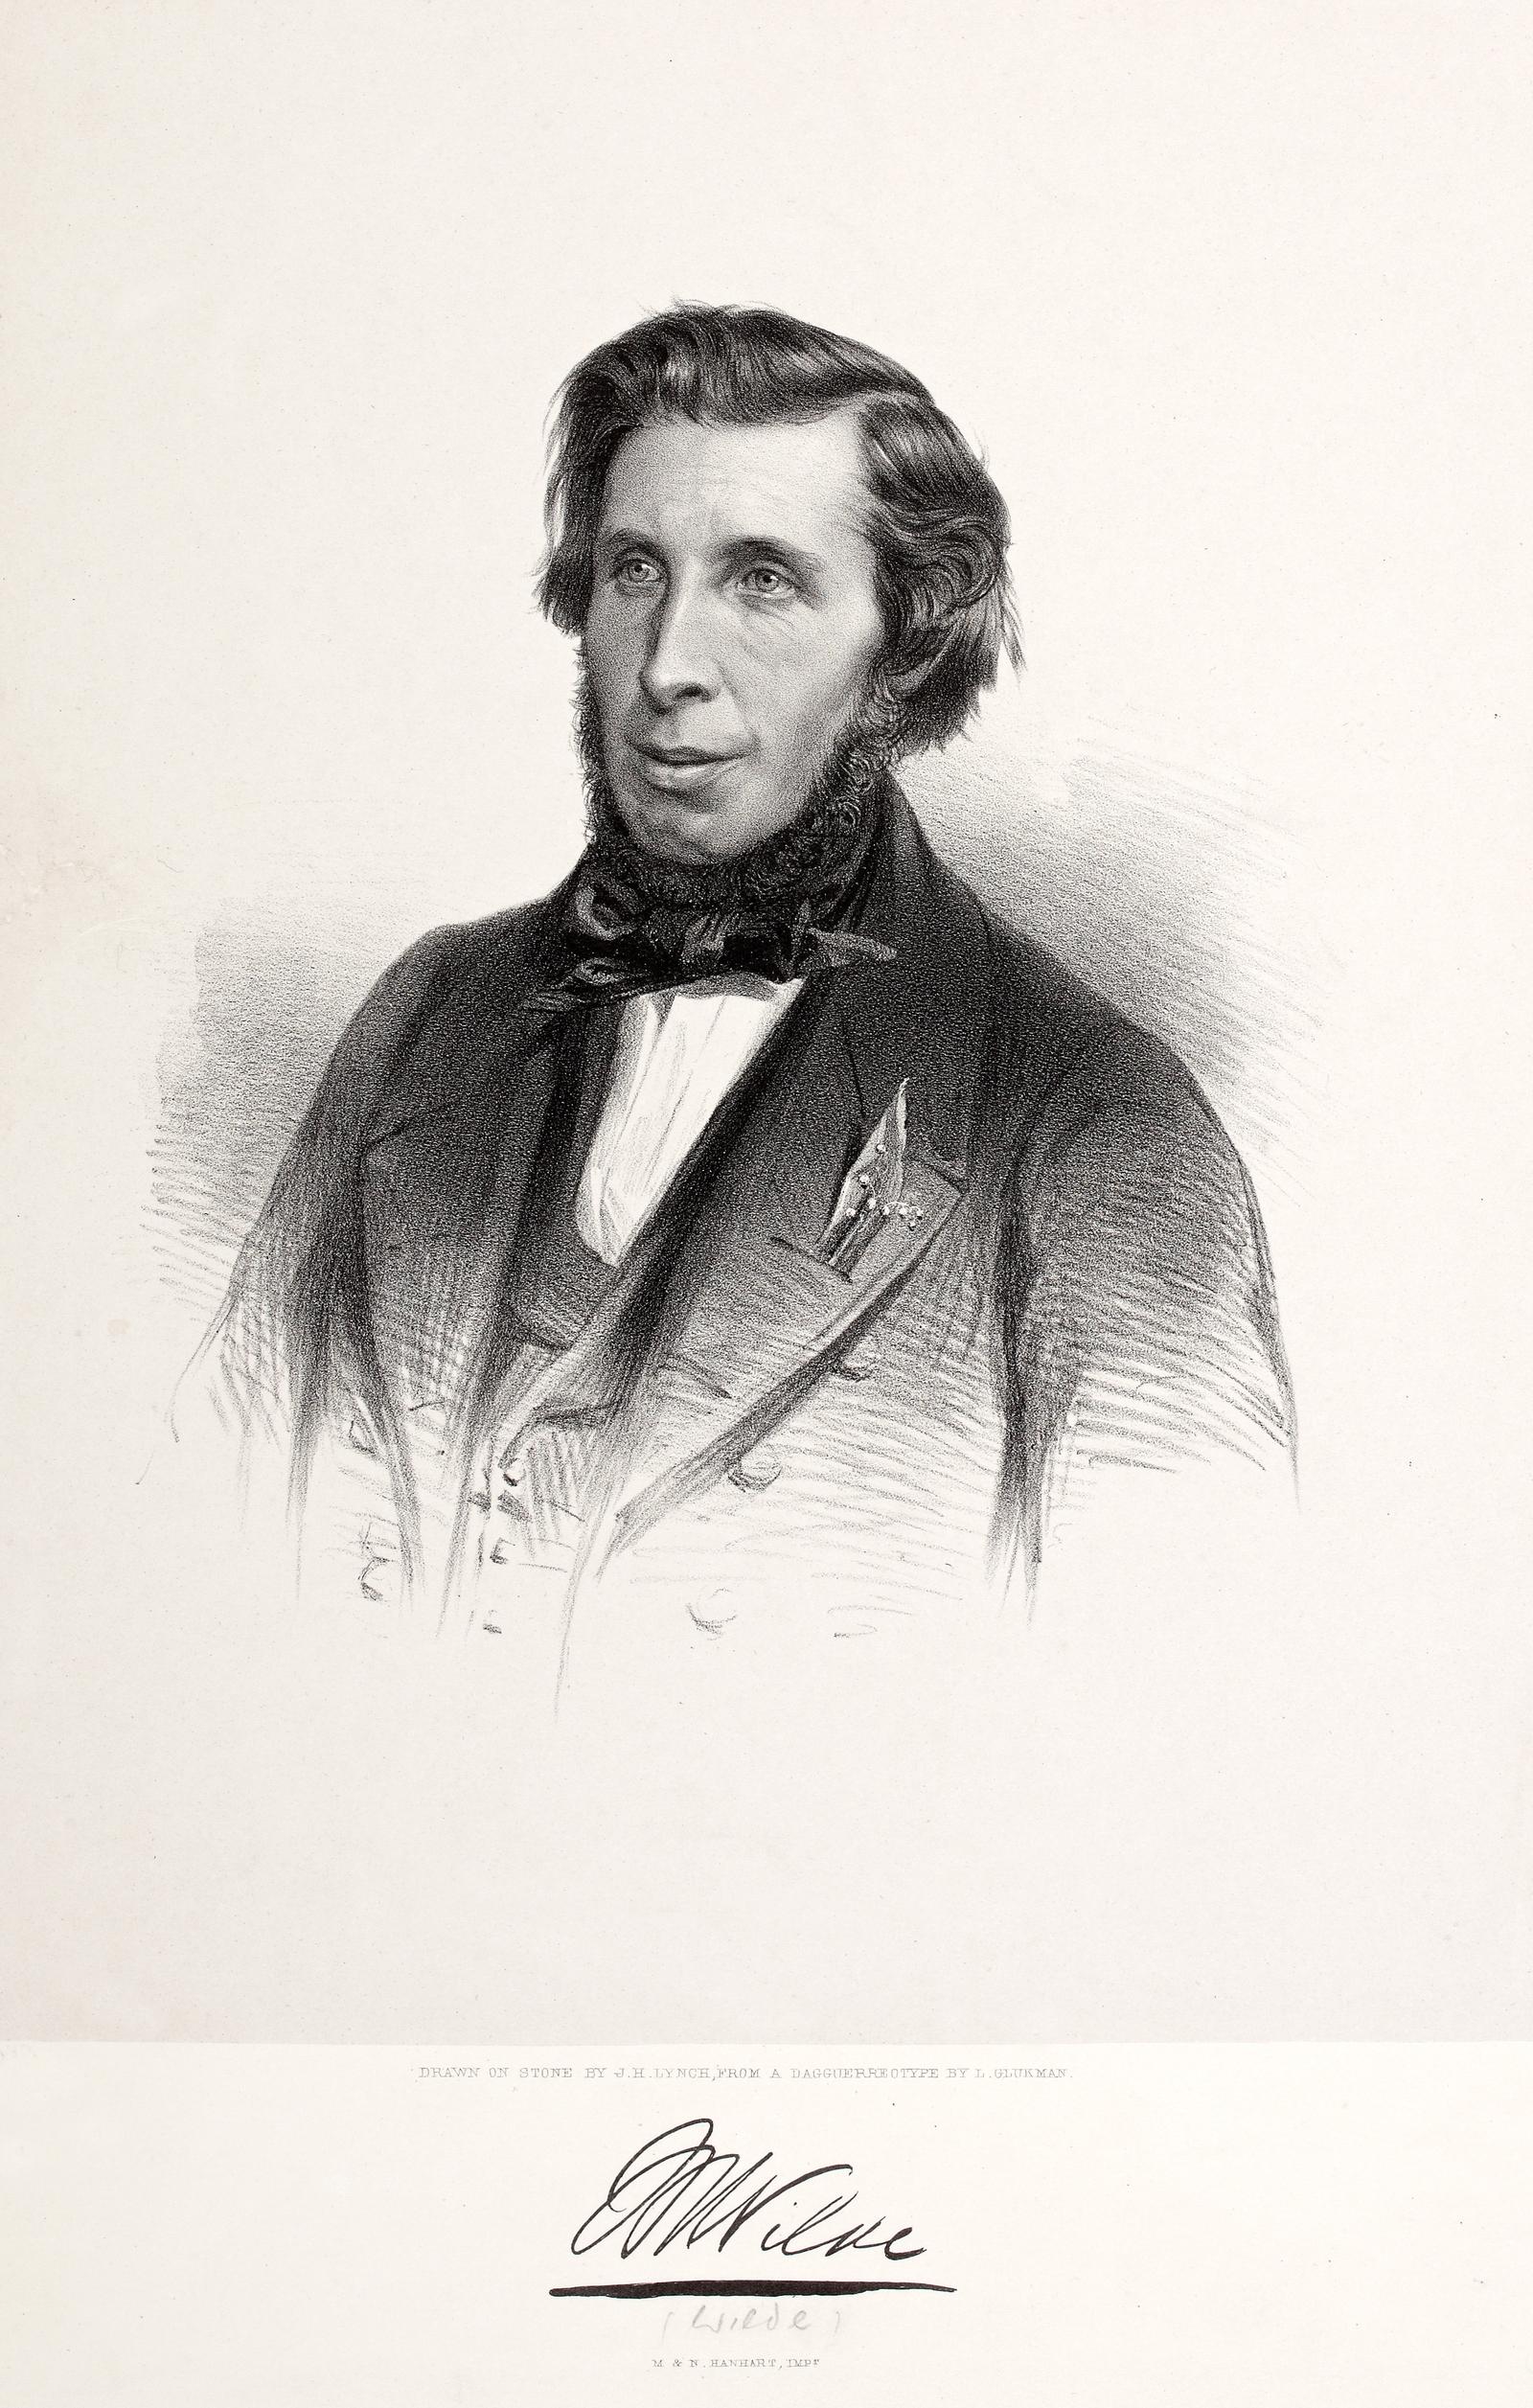 Image - William Wilde. Image courtesy of the National Library of Ireland